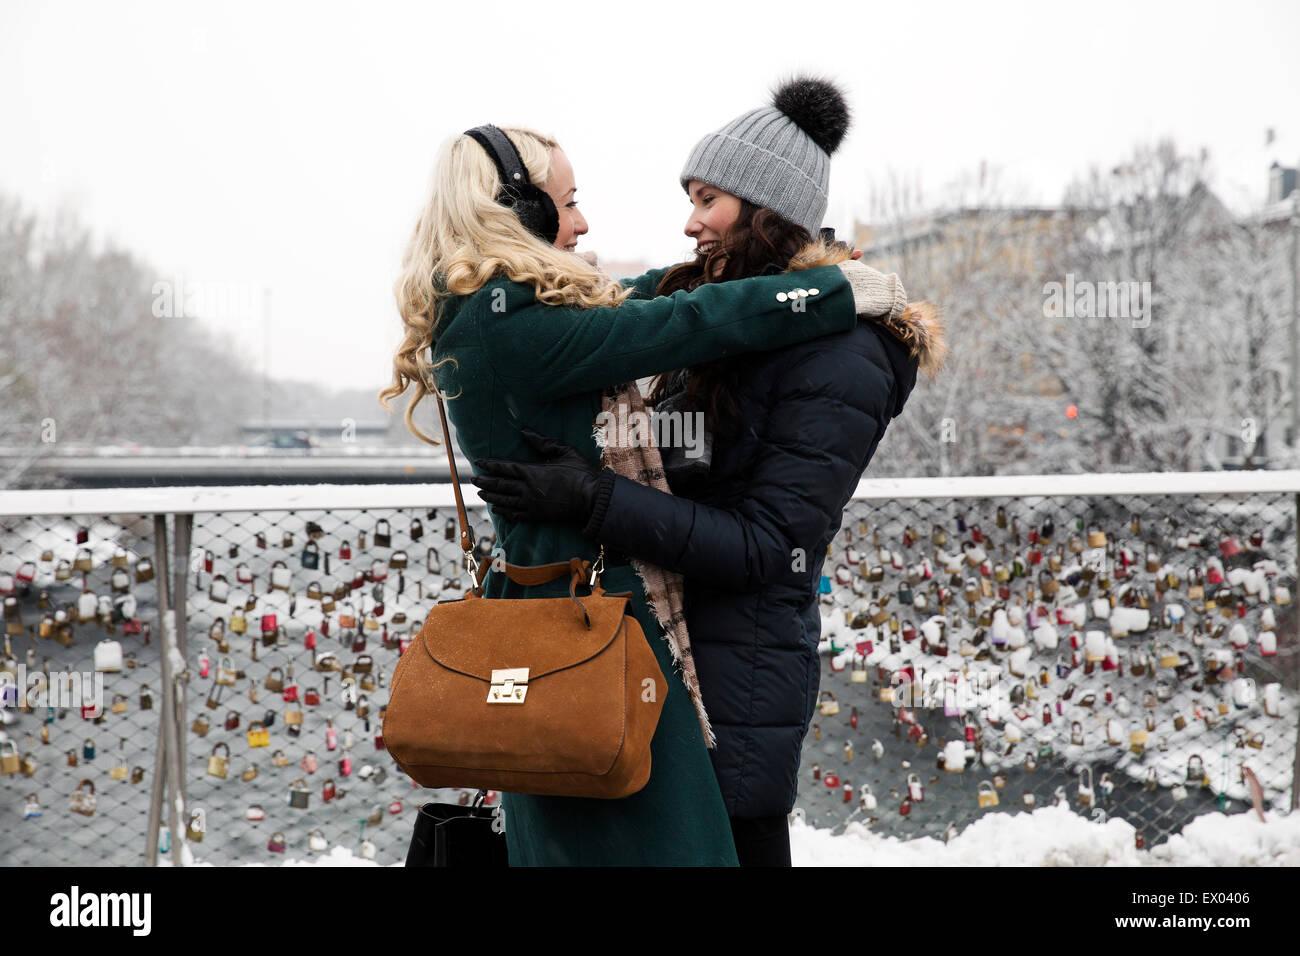 Deux Mid adult women hugging on bridge Photo Stock